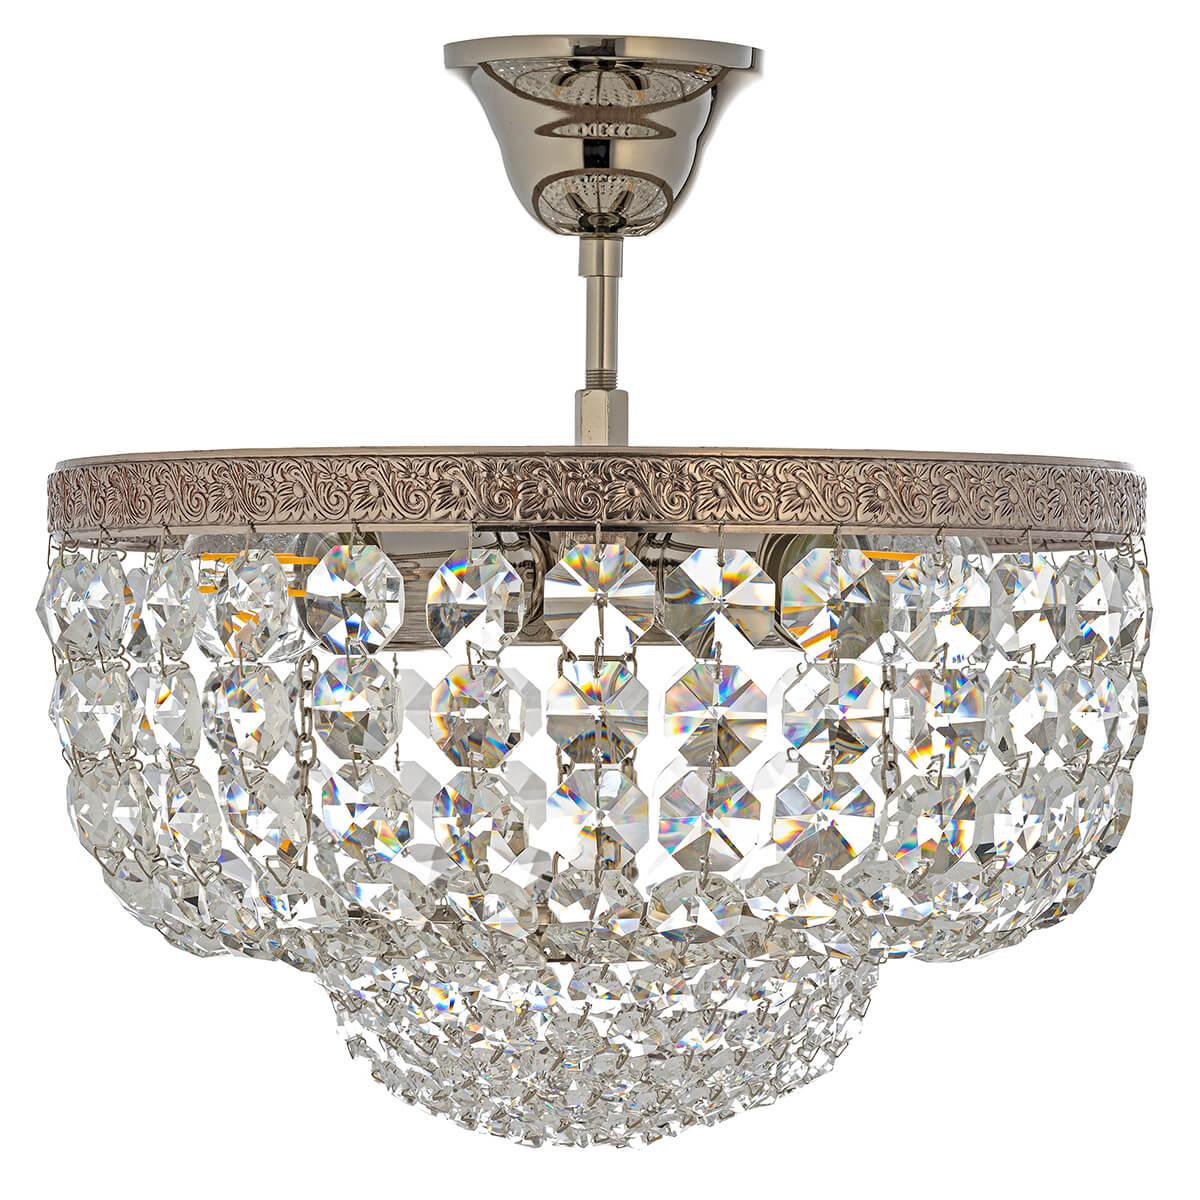 Светильник Arti Lampadari Favola E 1.3.30.501 N Nickel